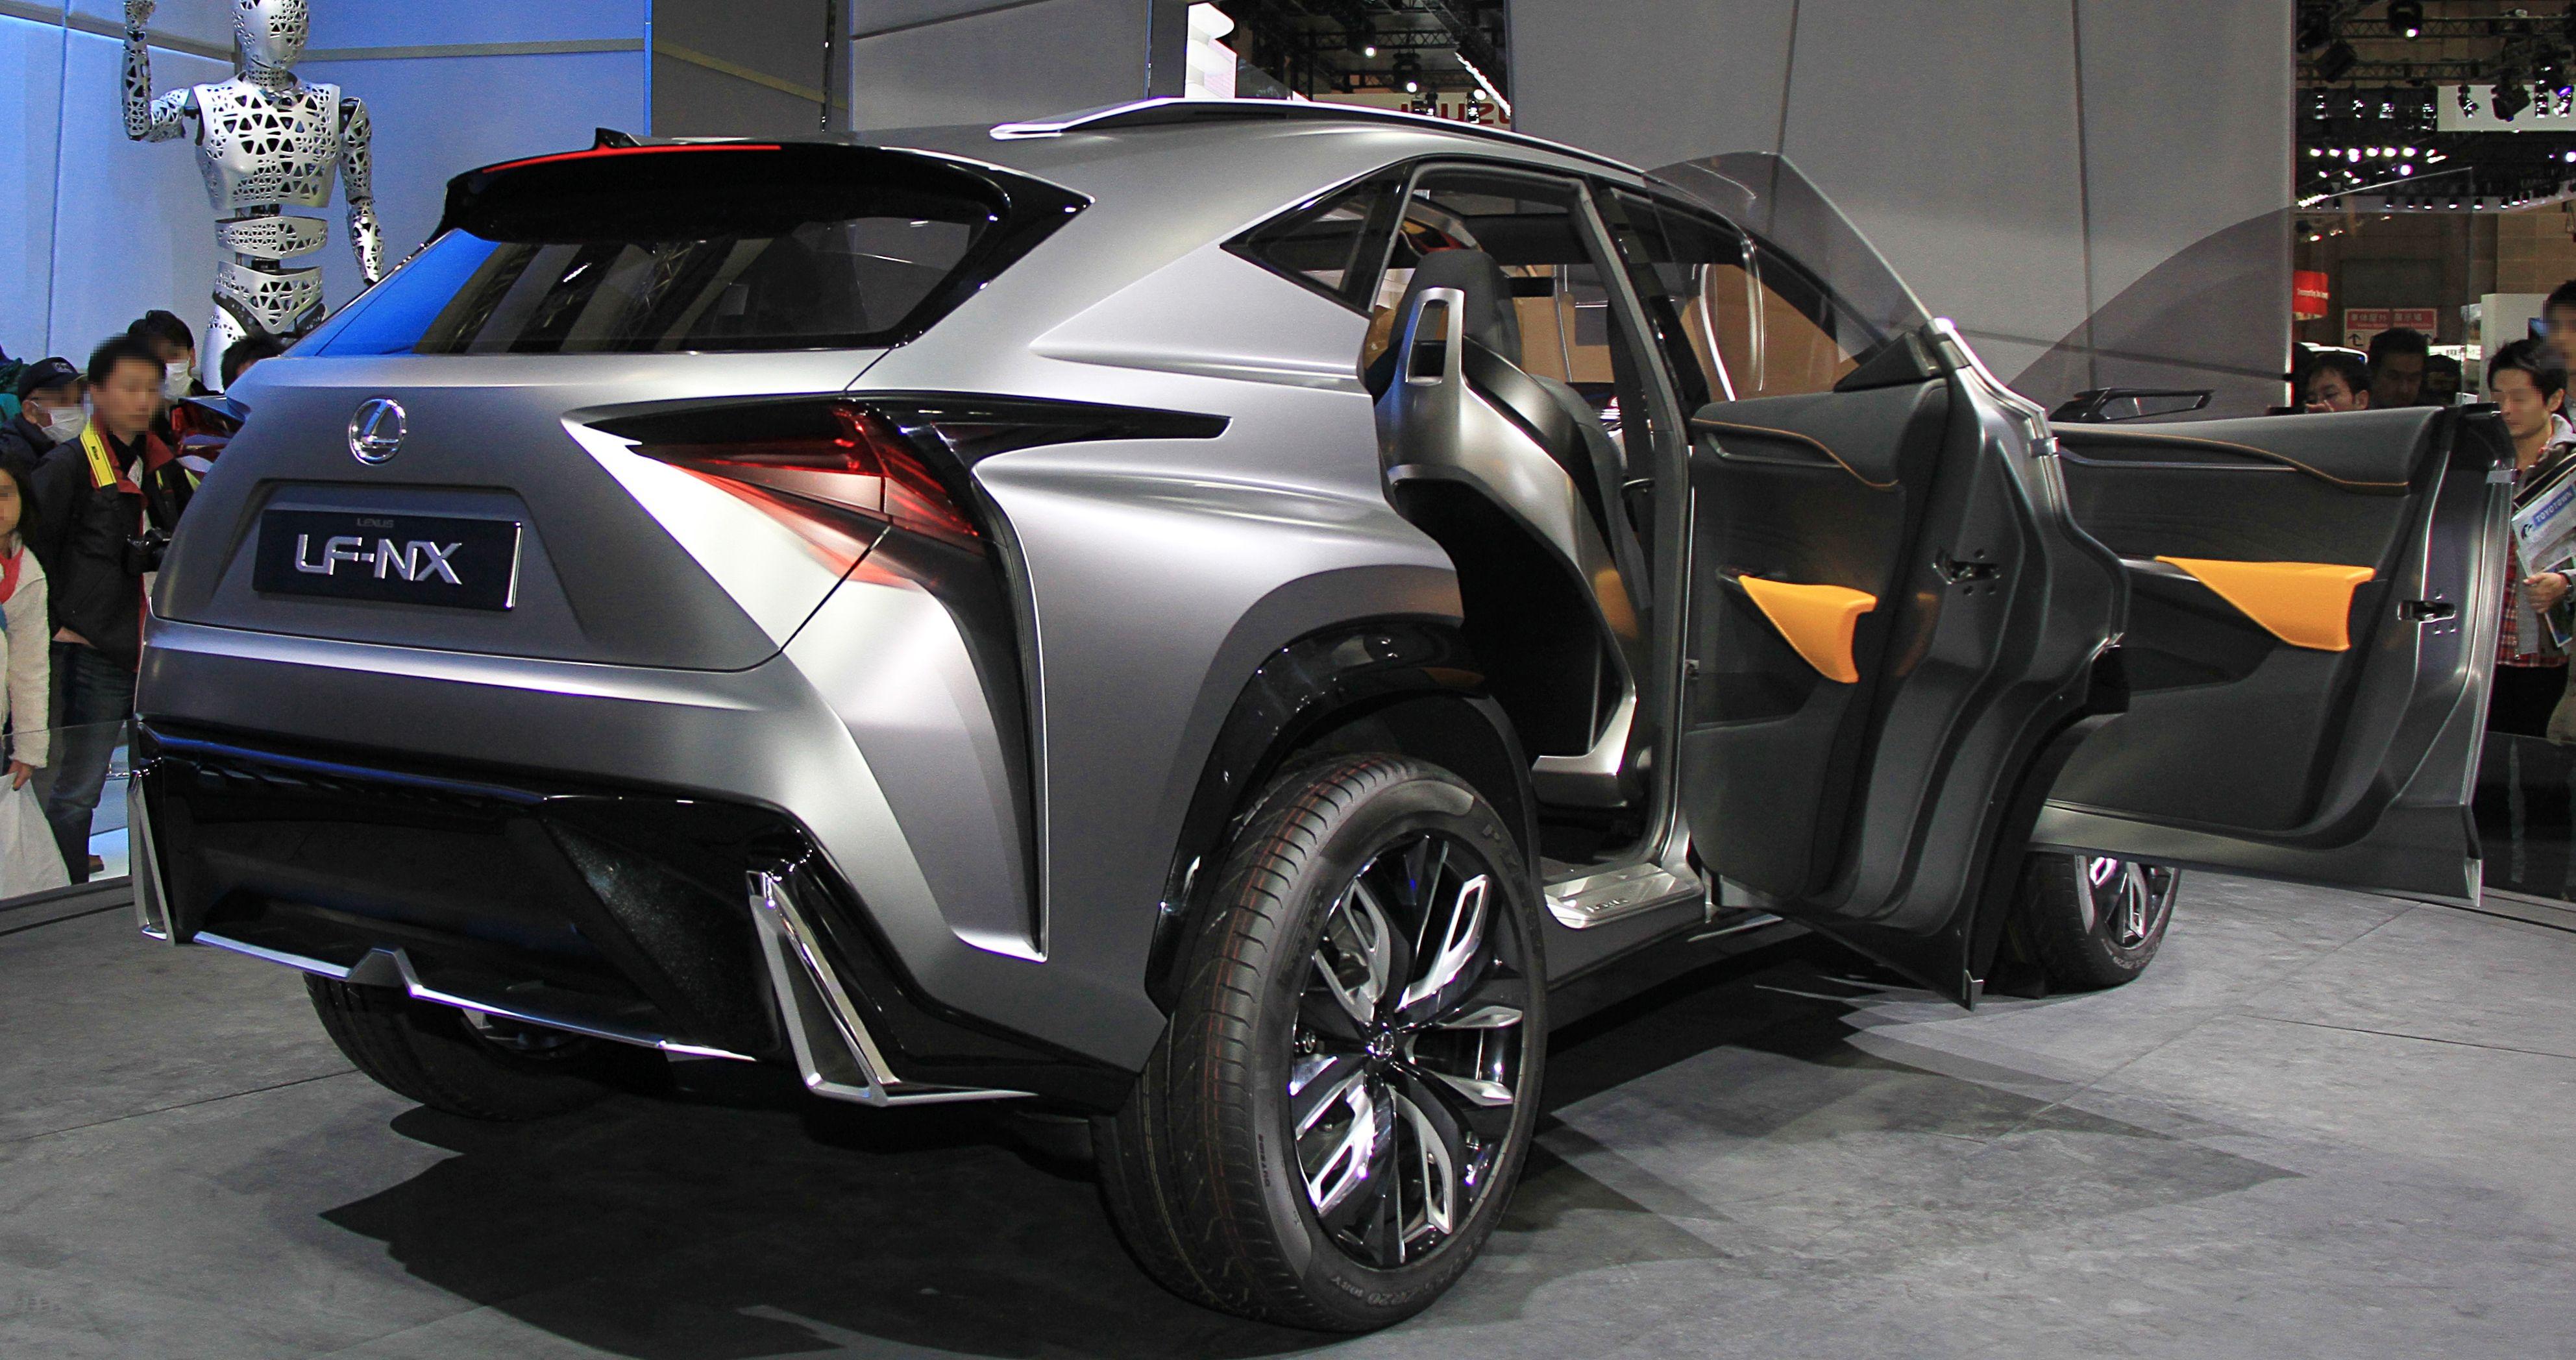 https://upload.wikimedia.org/wikipedia/commons/d/dd/Lexus_LF-NX_rear.jpg